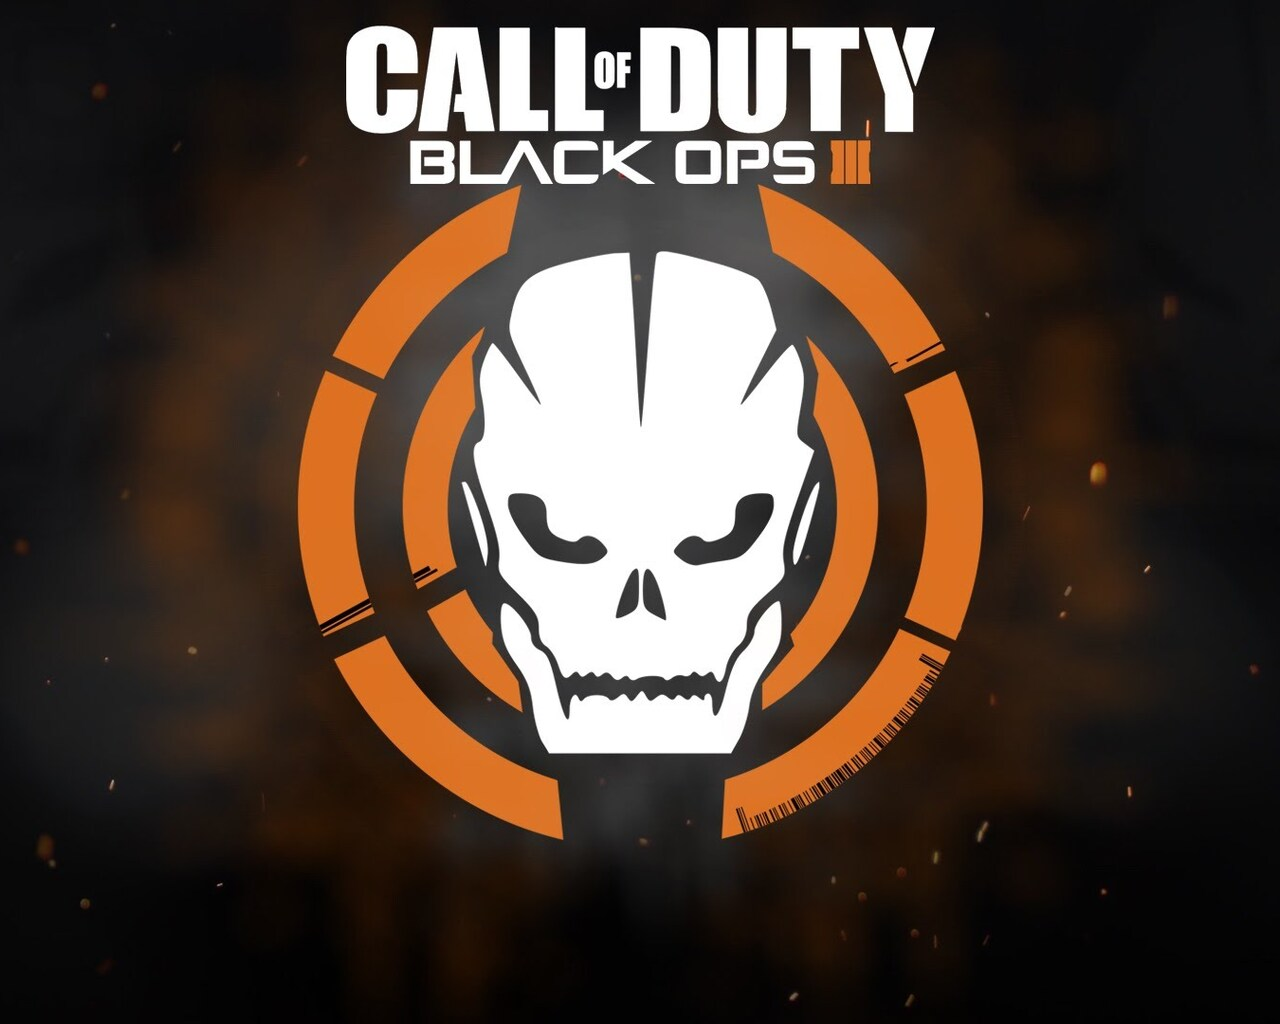 1280x1024 Hd Call Of Duty Black Ops 3 1280x1024 Resolution Hd 4k